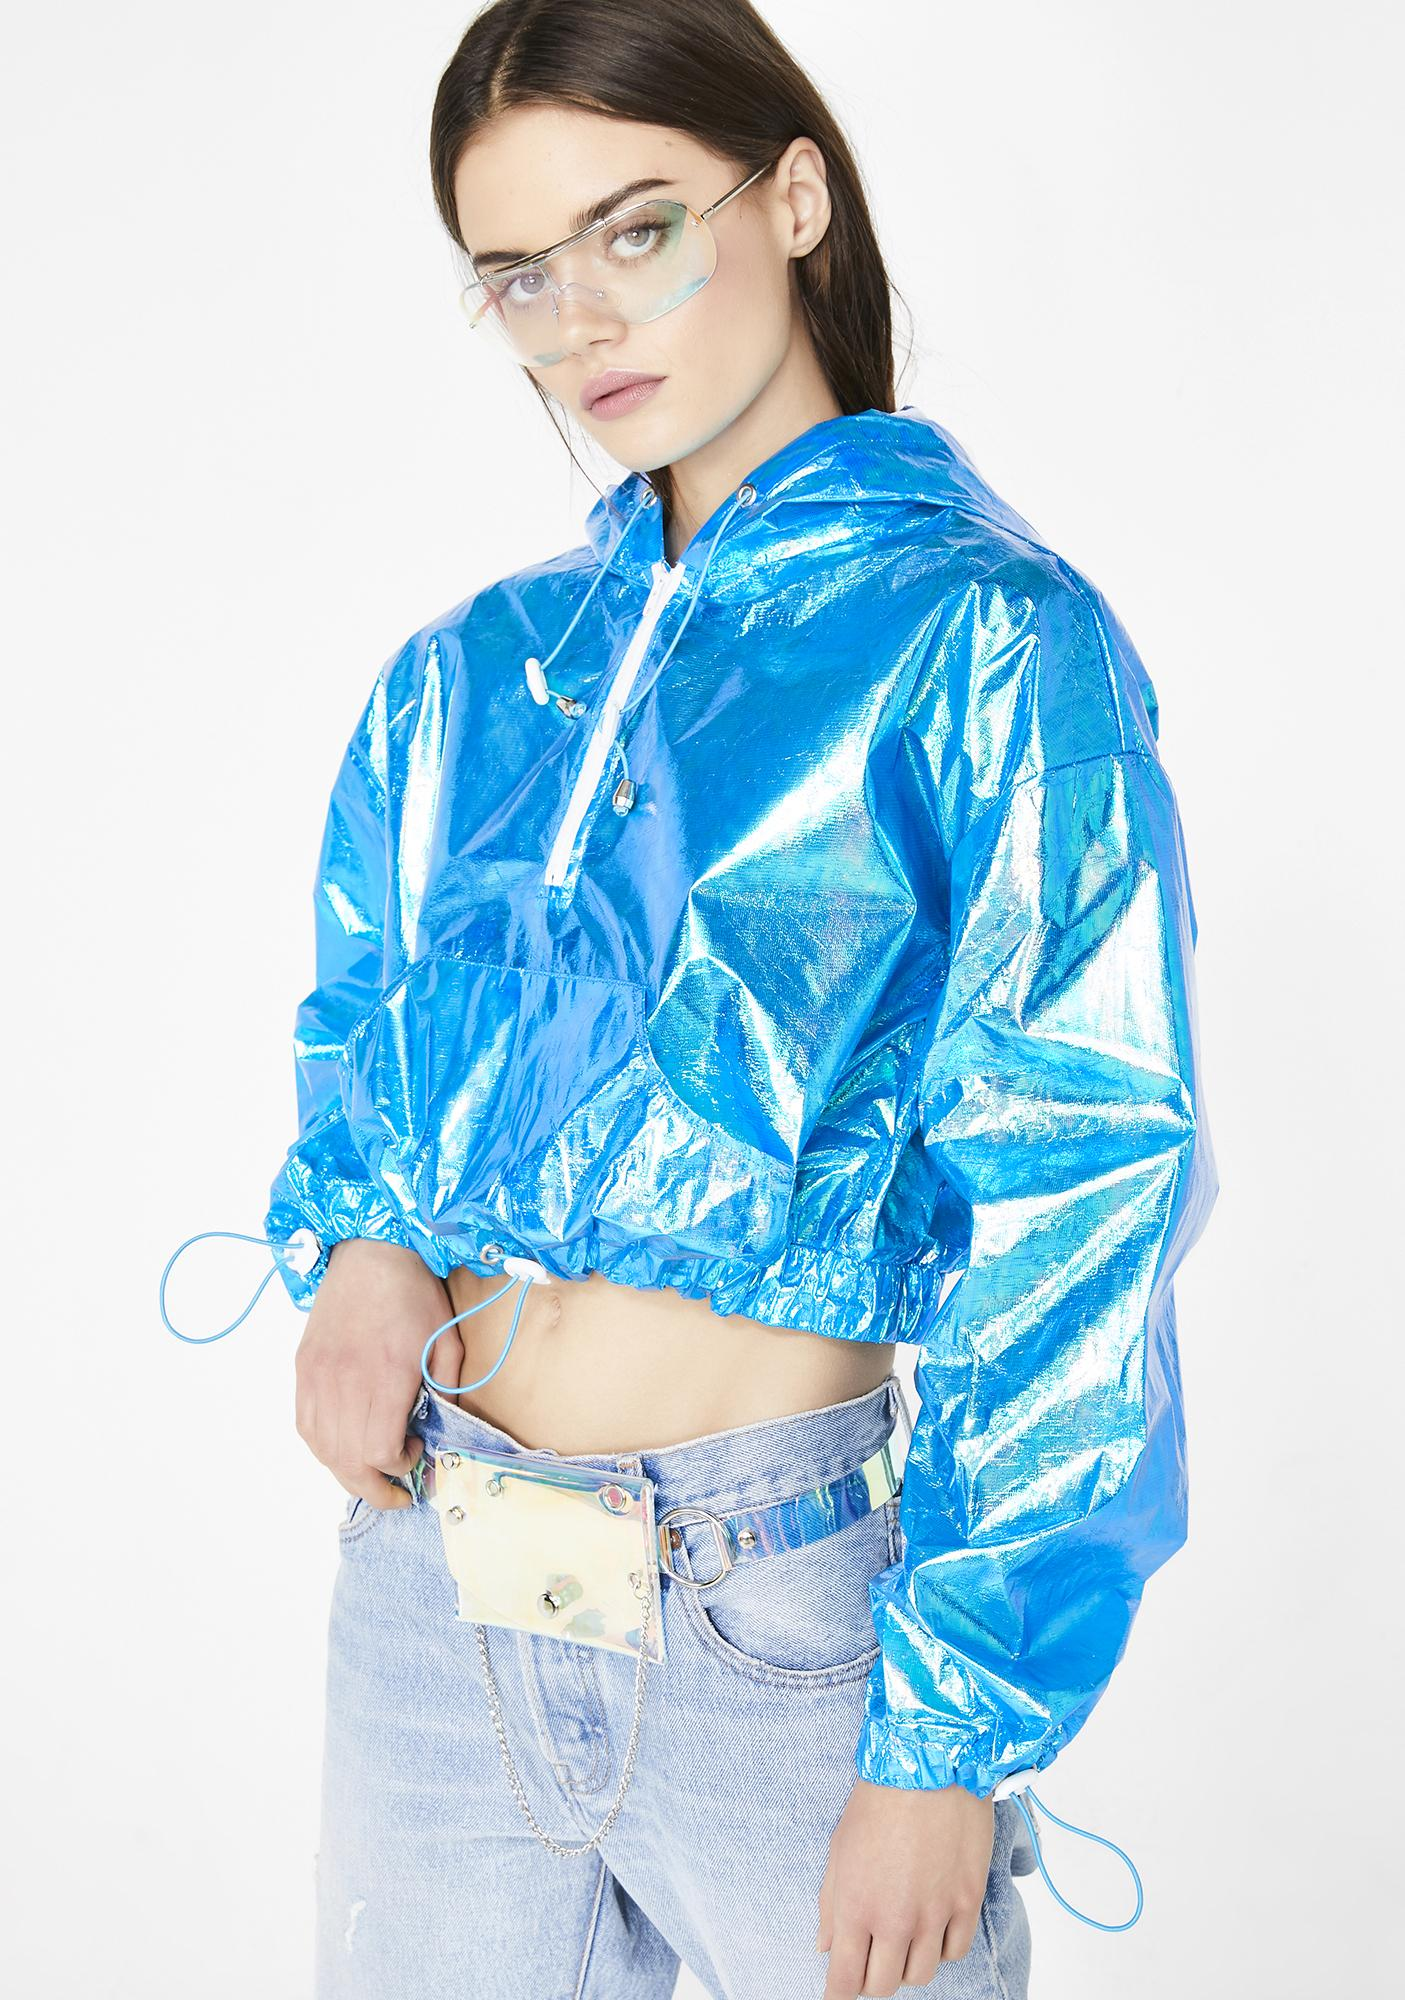 Cobalt Electric Slide Iridescent Jacket